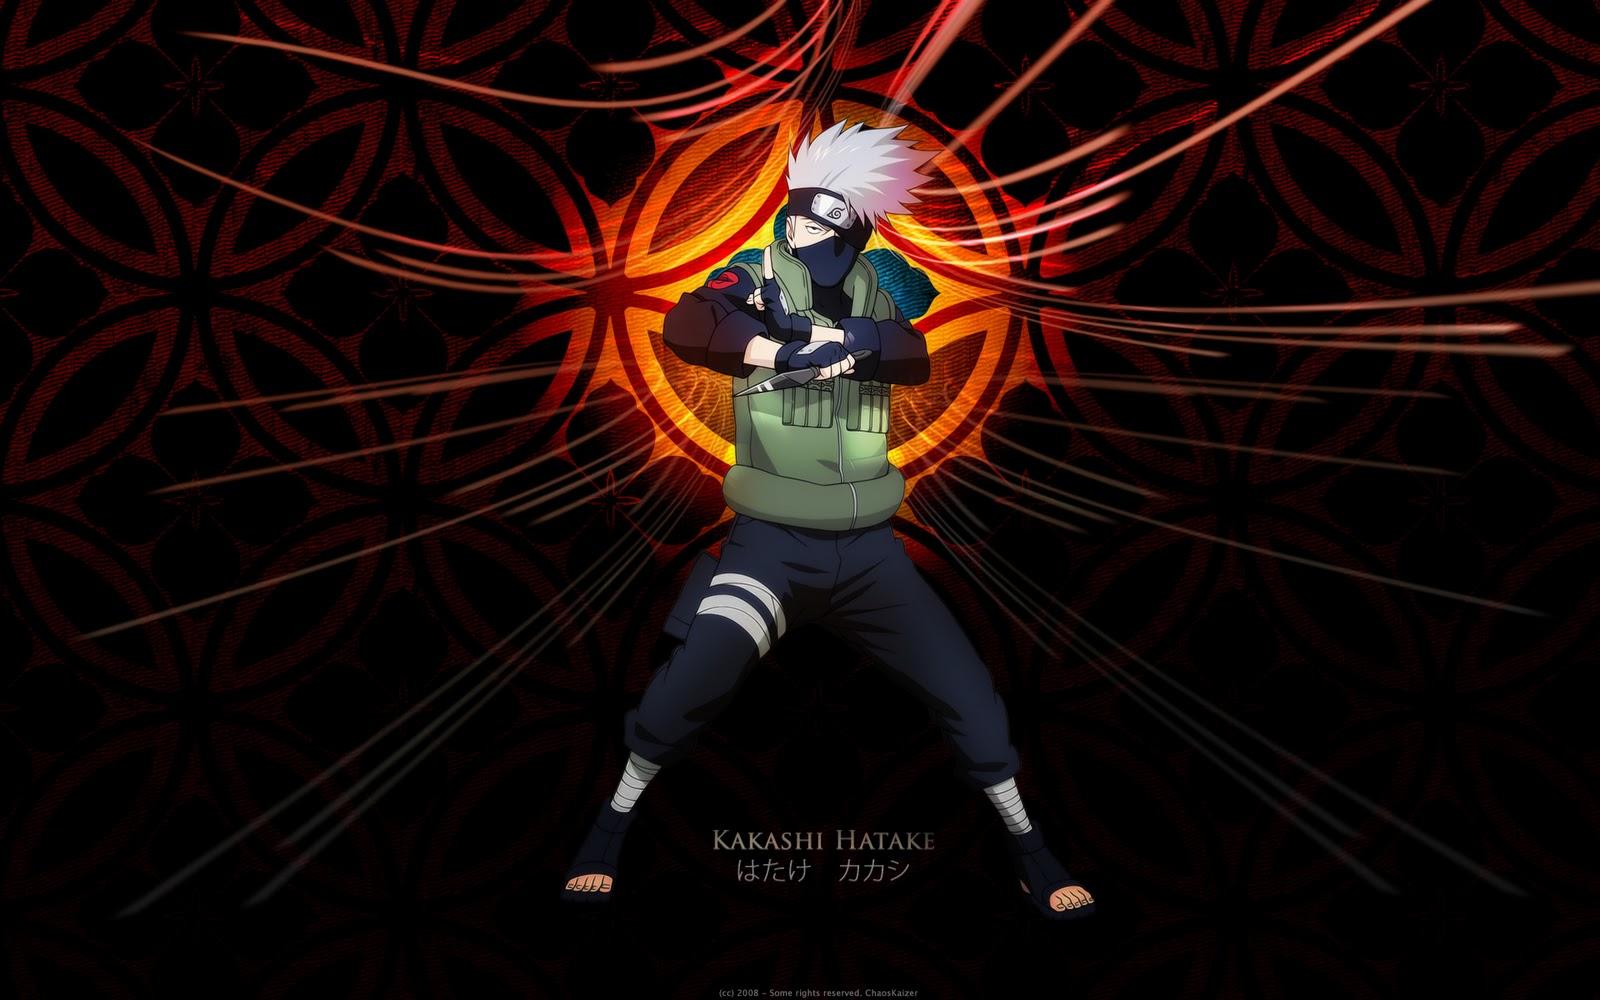 Naruto Shippuden HQ Wallpapers   Fondos de Pantalla HD Naruto 1600x1000